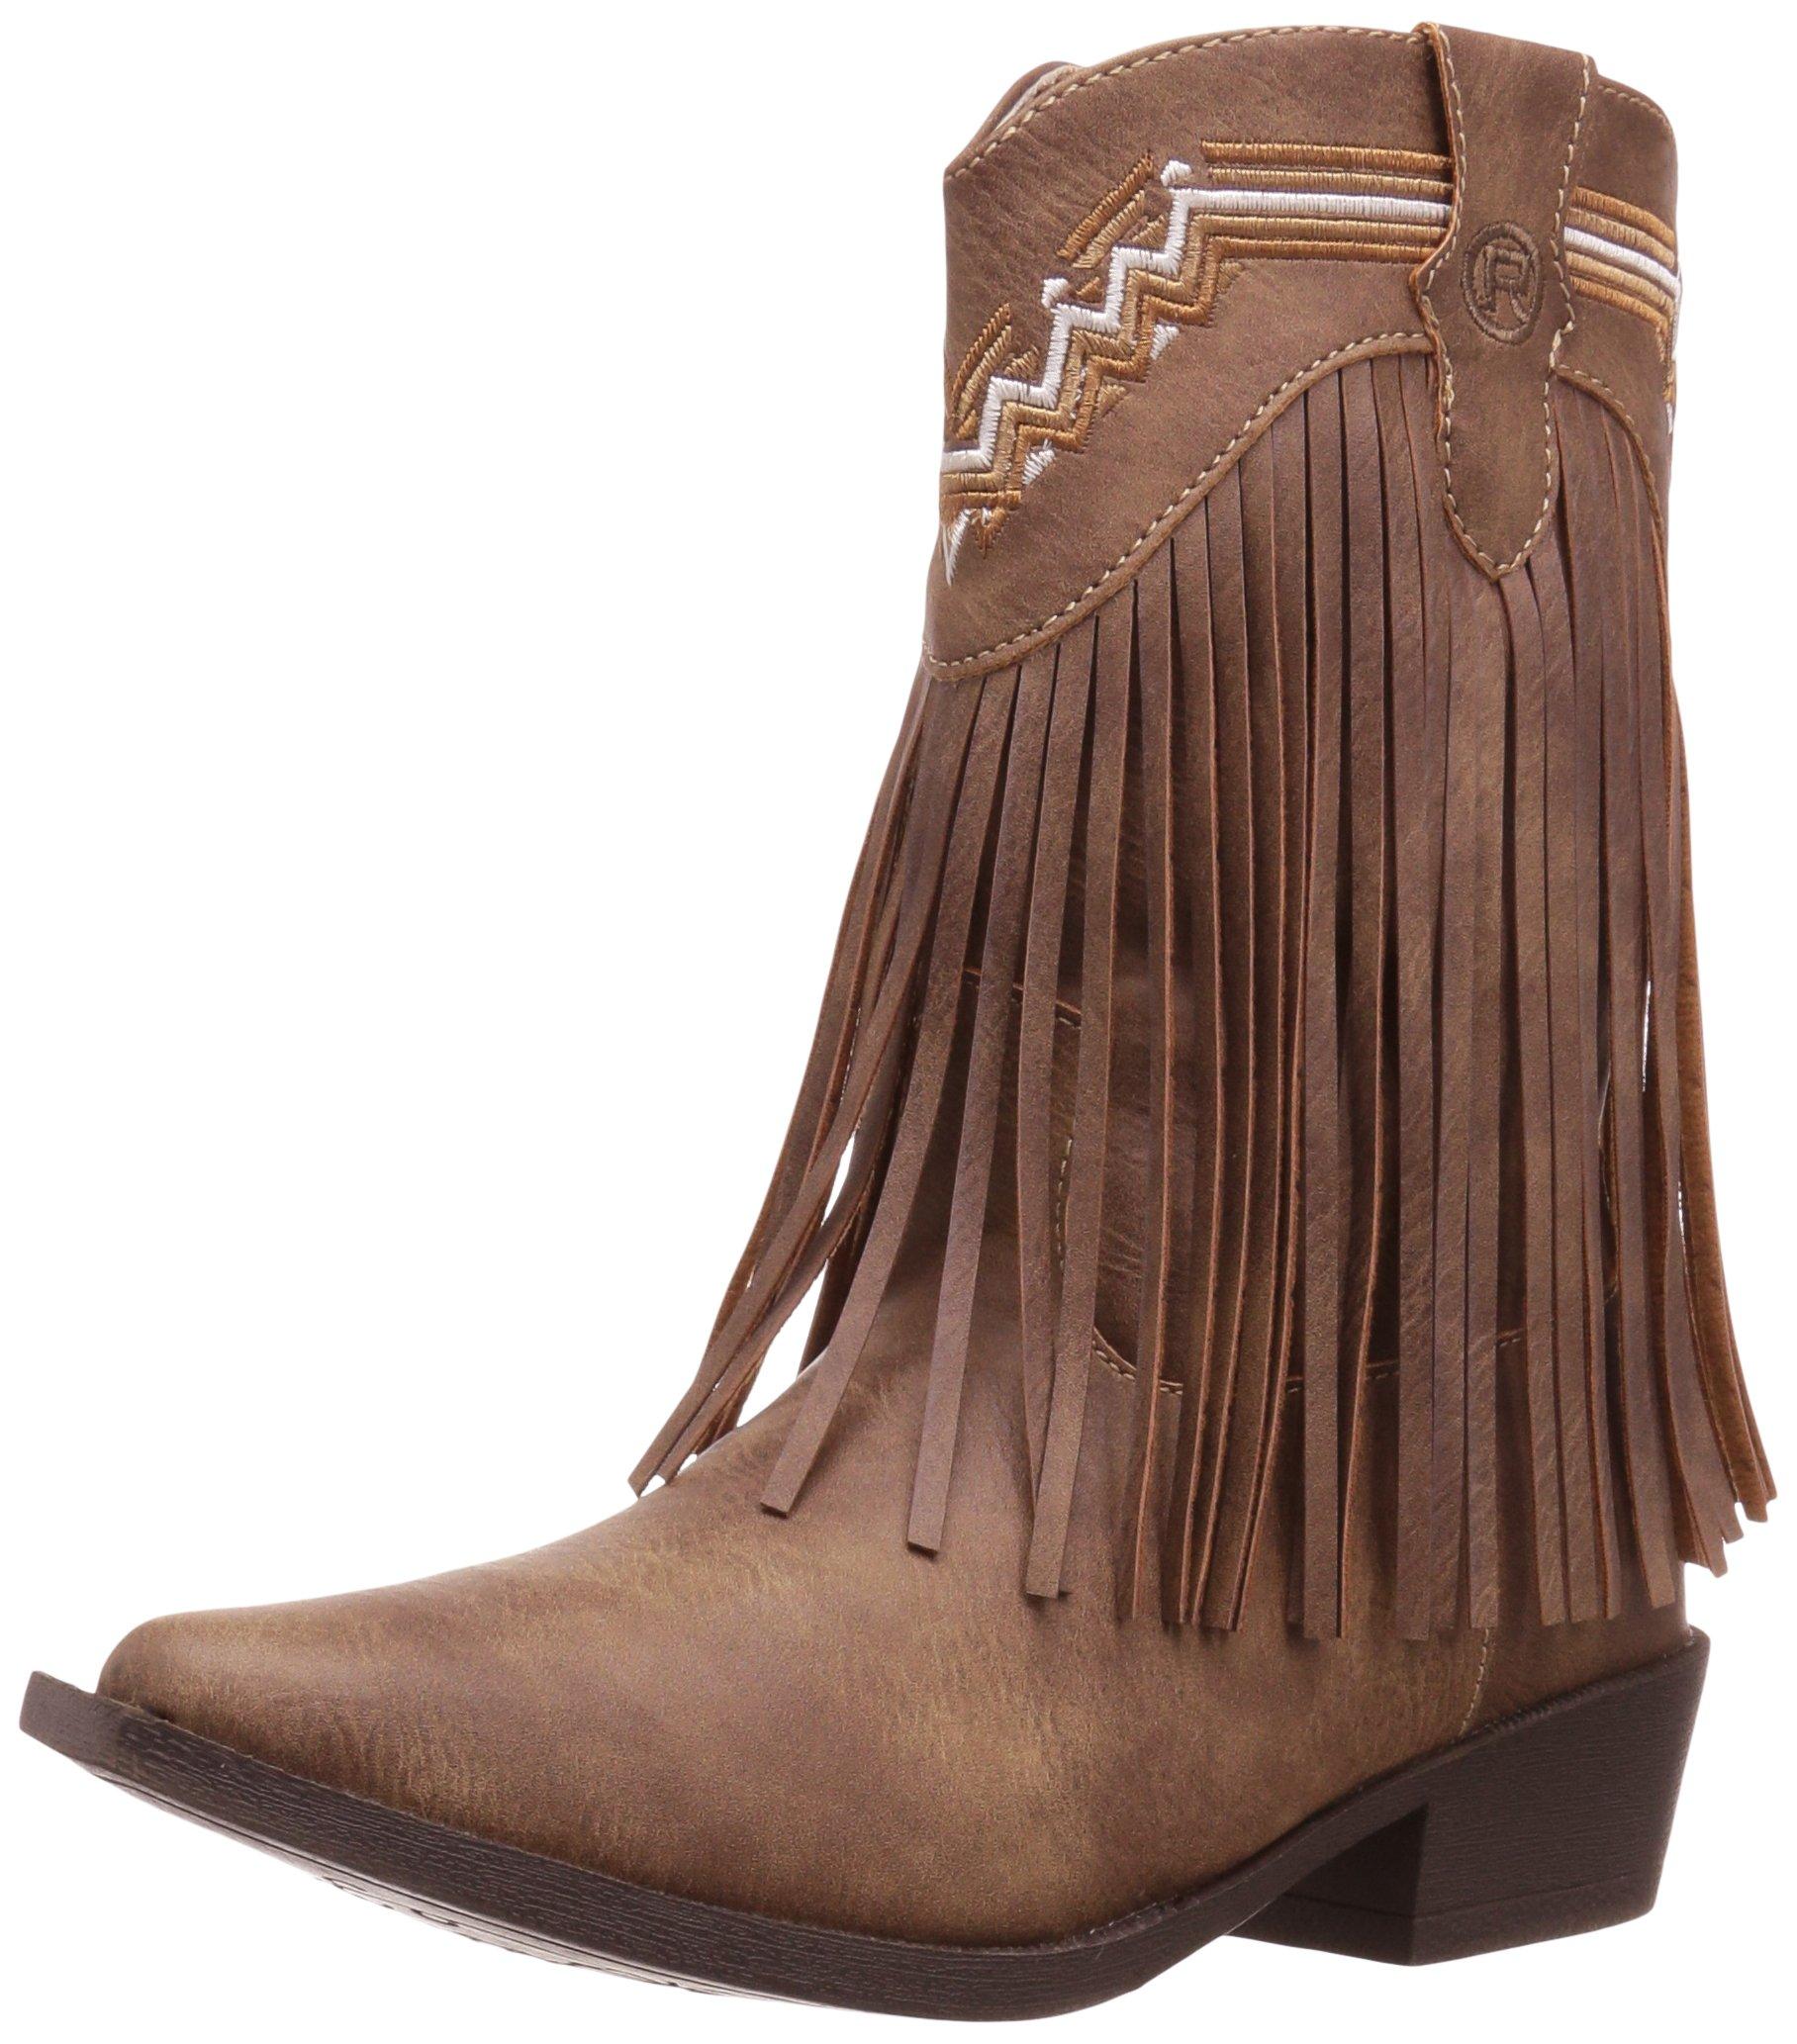 Roper Girls' Fringes Western Boot, Tan, 12 Child US Little Kid